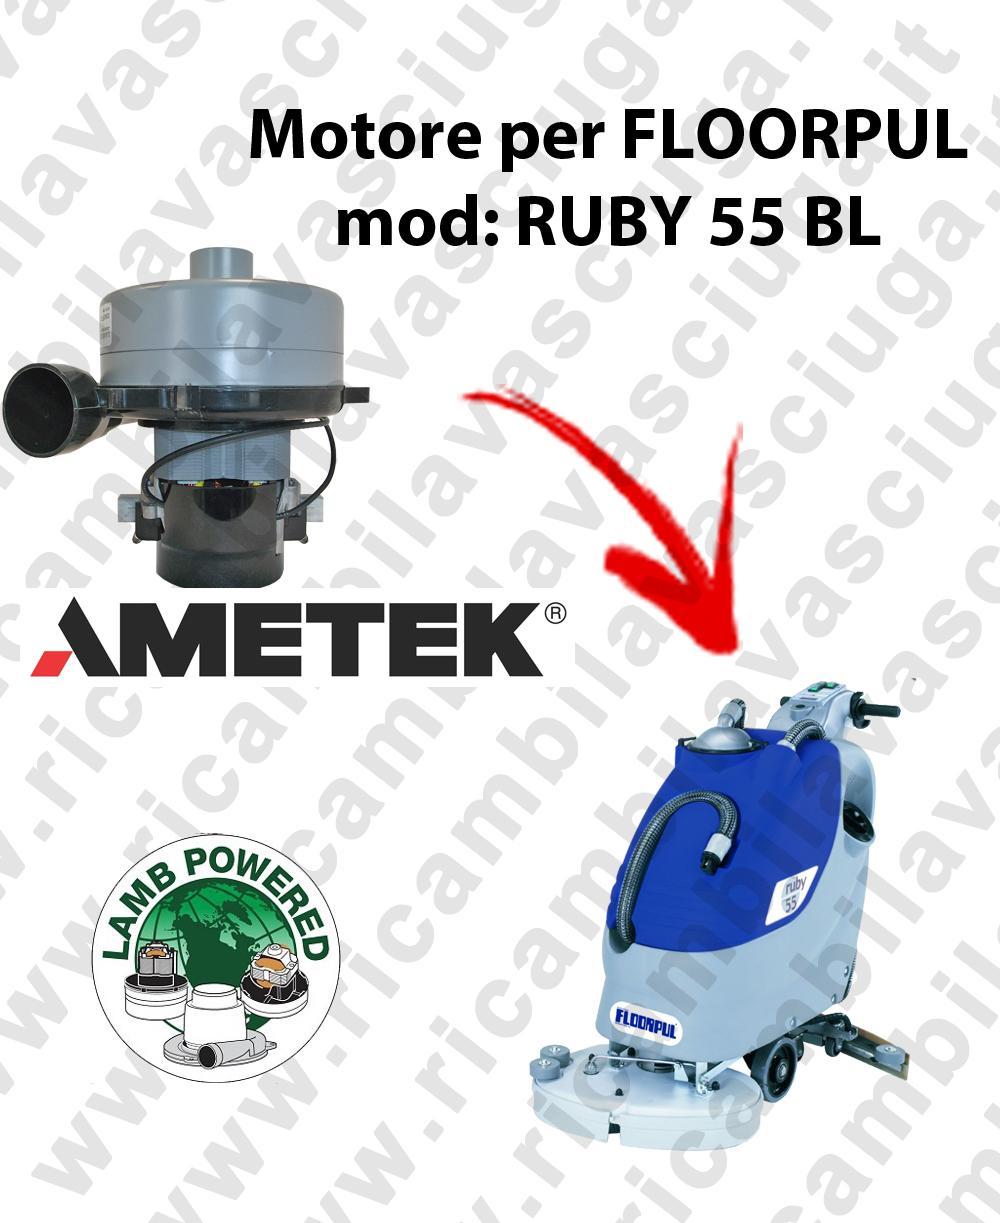 RUBY 55 BL MOTORE LAMB AMETEK di aspirazione per lavapavimenti FLOORPUL